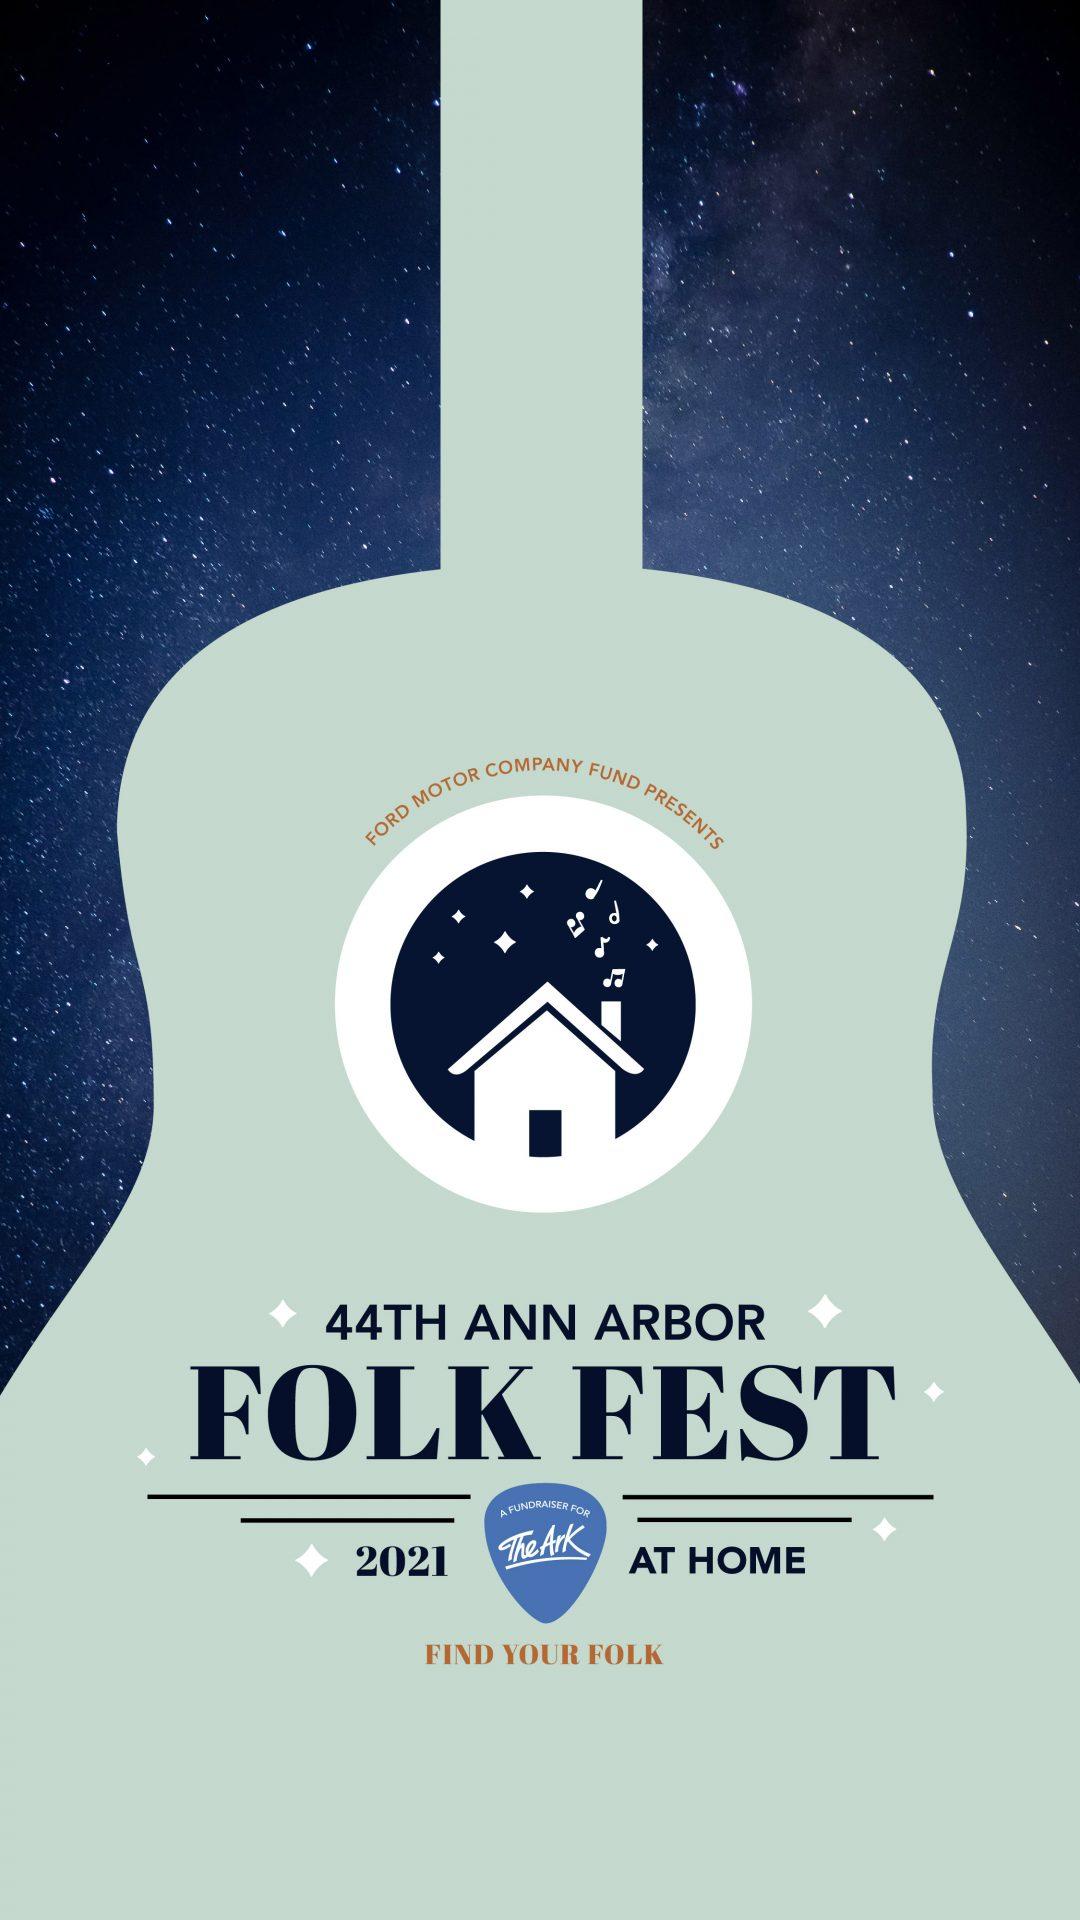 Join Colin at the 44th Annual Ann Arbor Folk Festival!